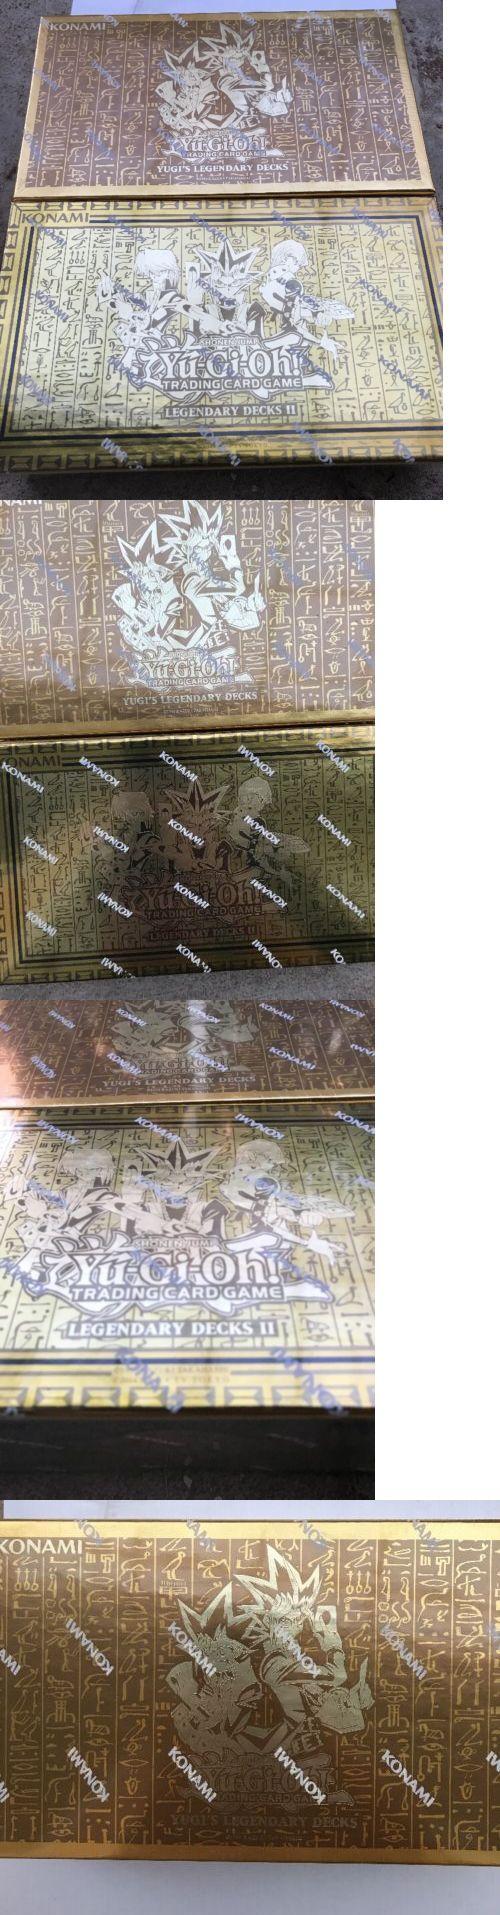 Yu-Gi-Oh Sealed Decks and Kits 183452: Yugioh Legendary Decks Box 1 And 2 Brand New Sealed -> BUY IT NOW ONLY: $74.99 on eBay!